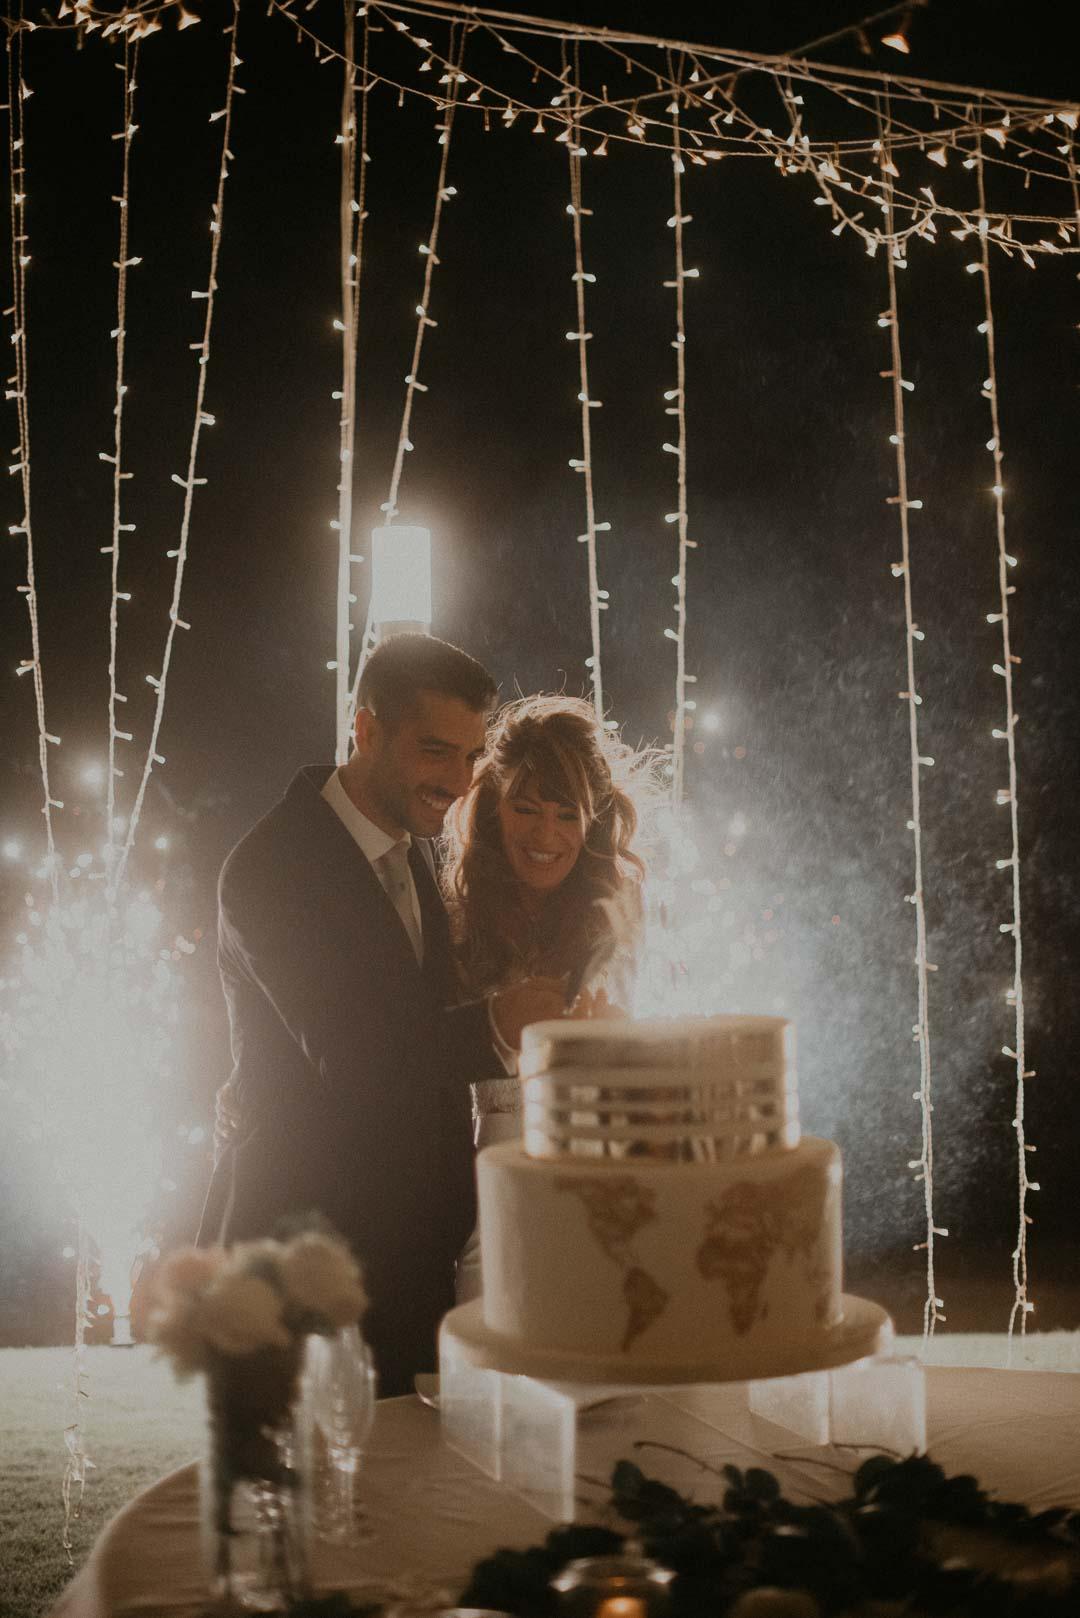 wedding-photographer-destination-fineart-bespoke-reportage-napoli-nabilah-vivianeizzo-spazio46-188